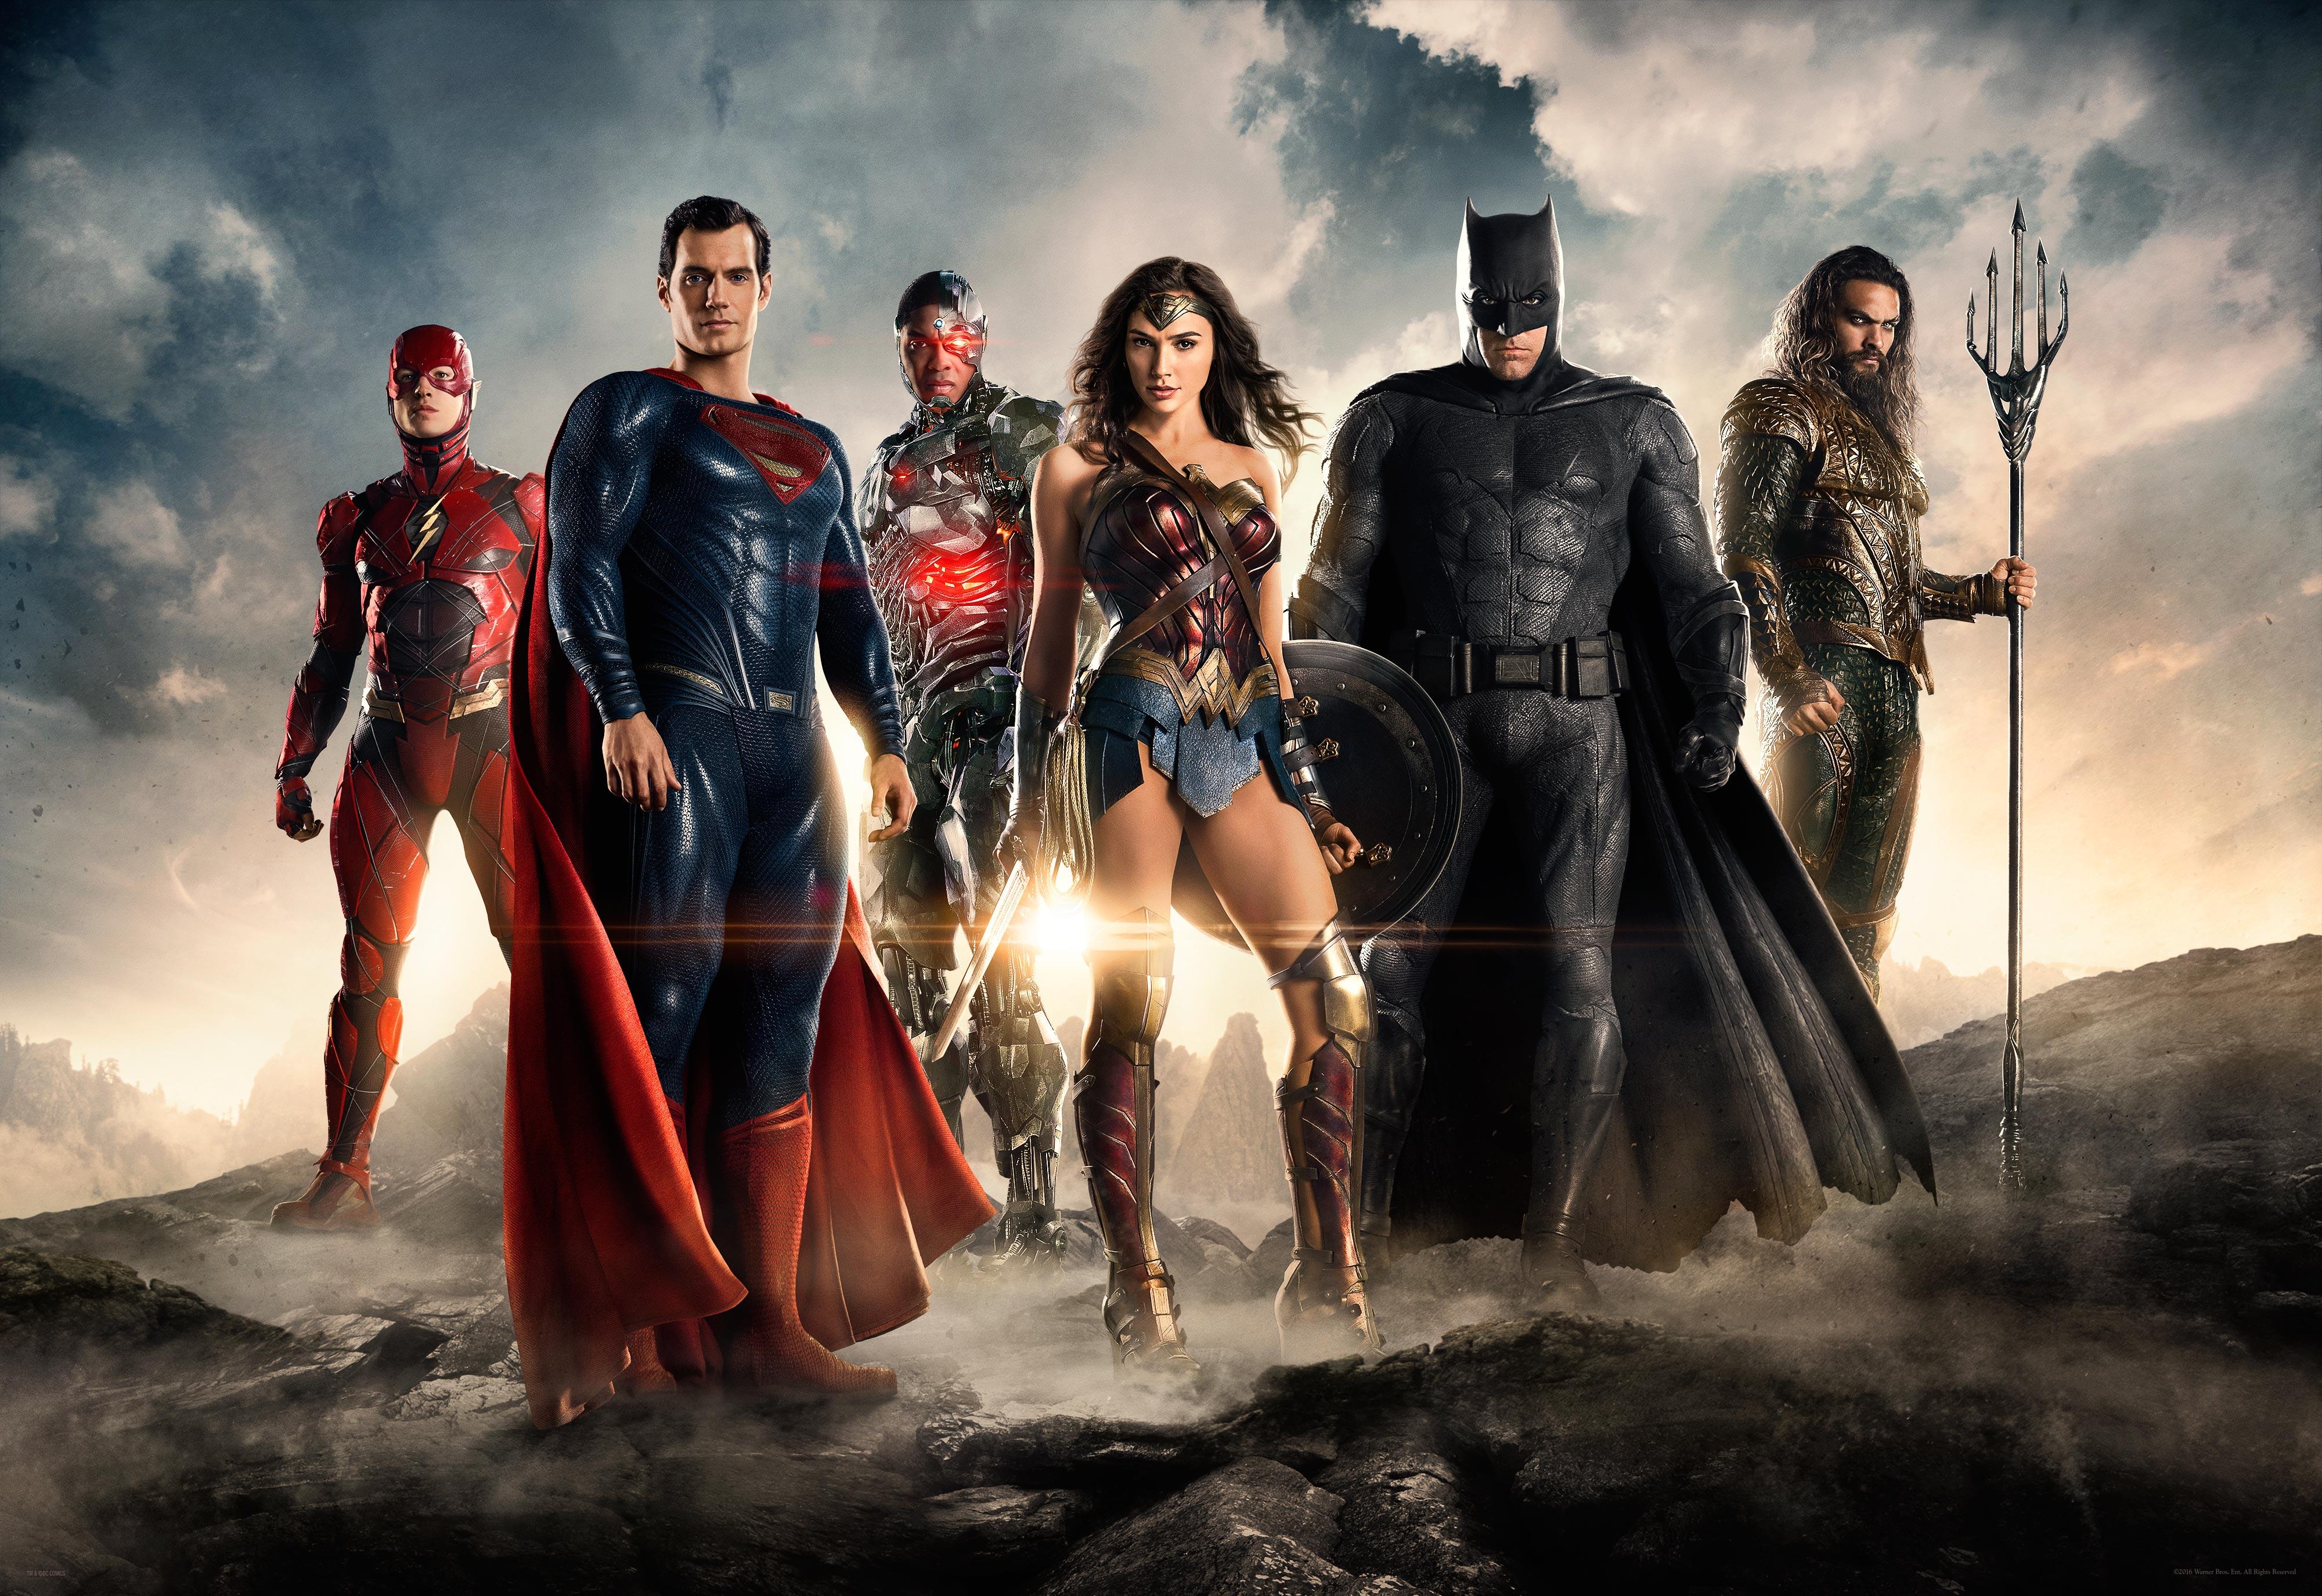 Liga da Justiça ganha seu primeiro teaser na Comic-Con 2016